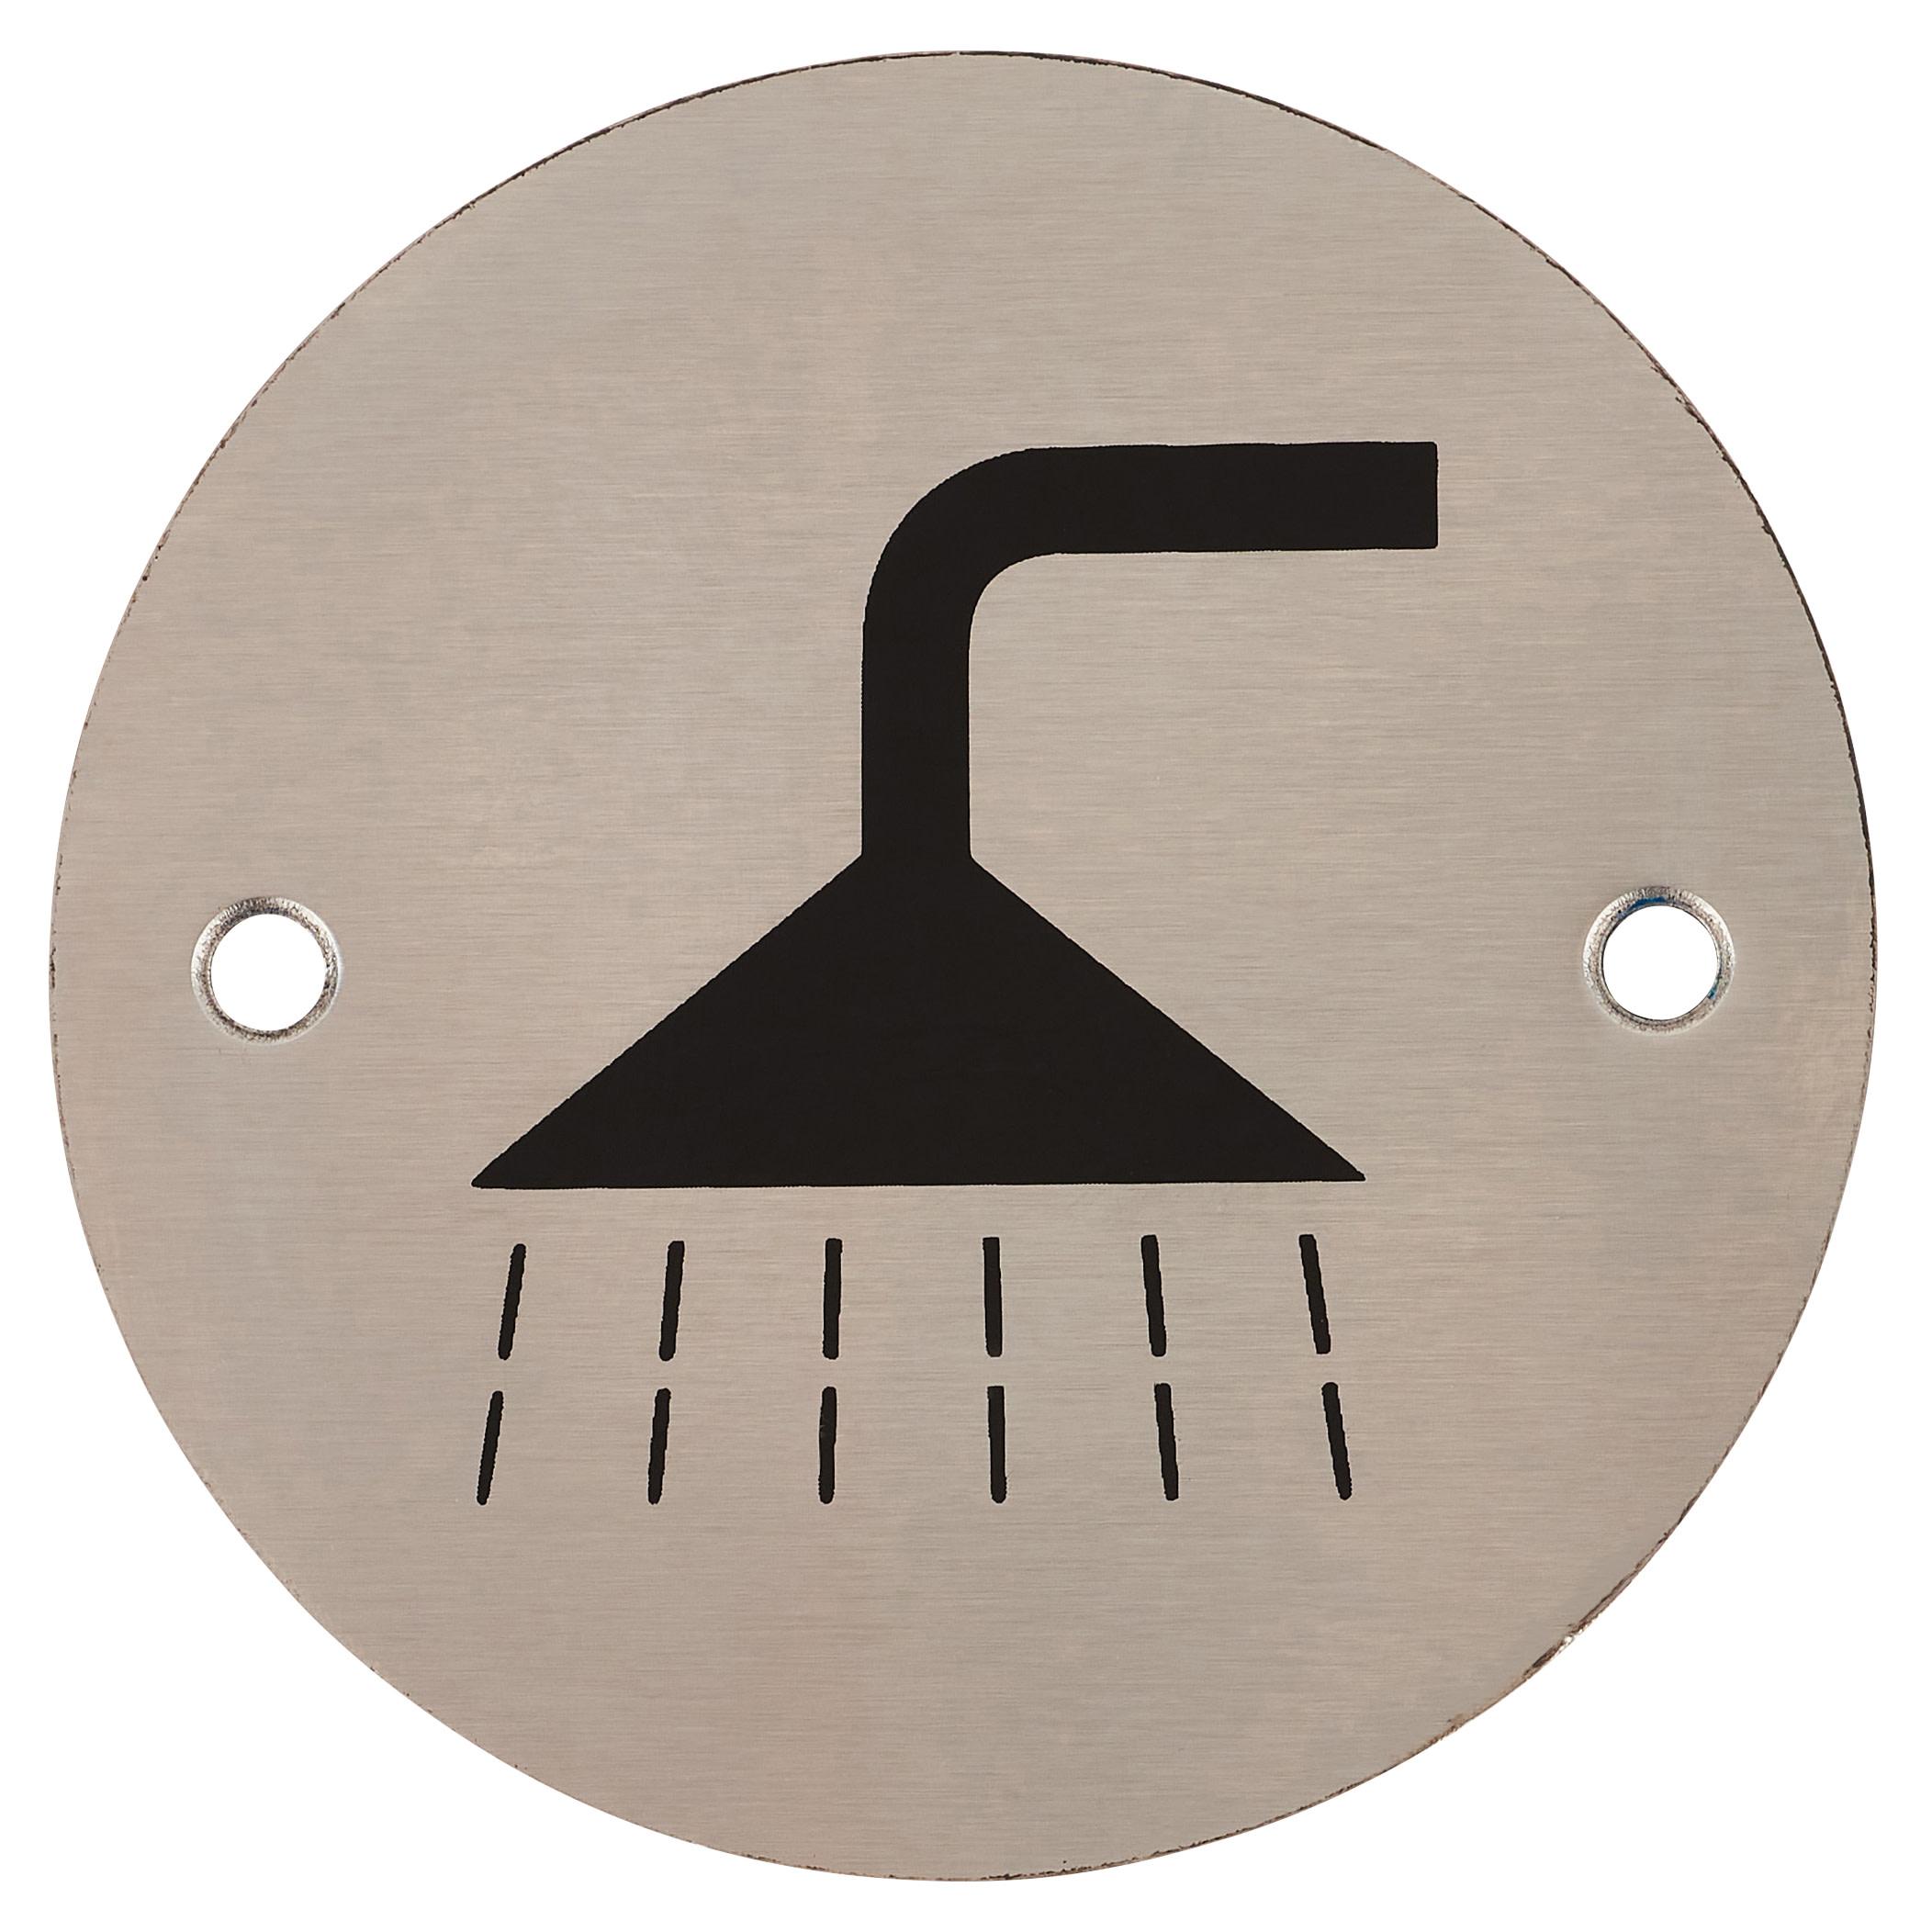 Shower - 75mm - Satin Stainless Steel)